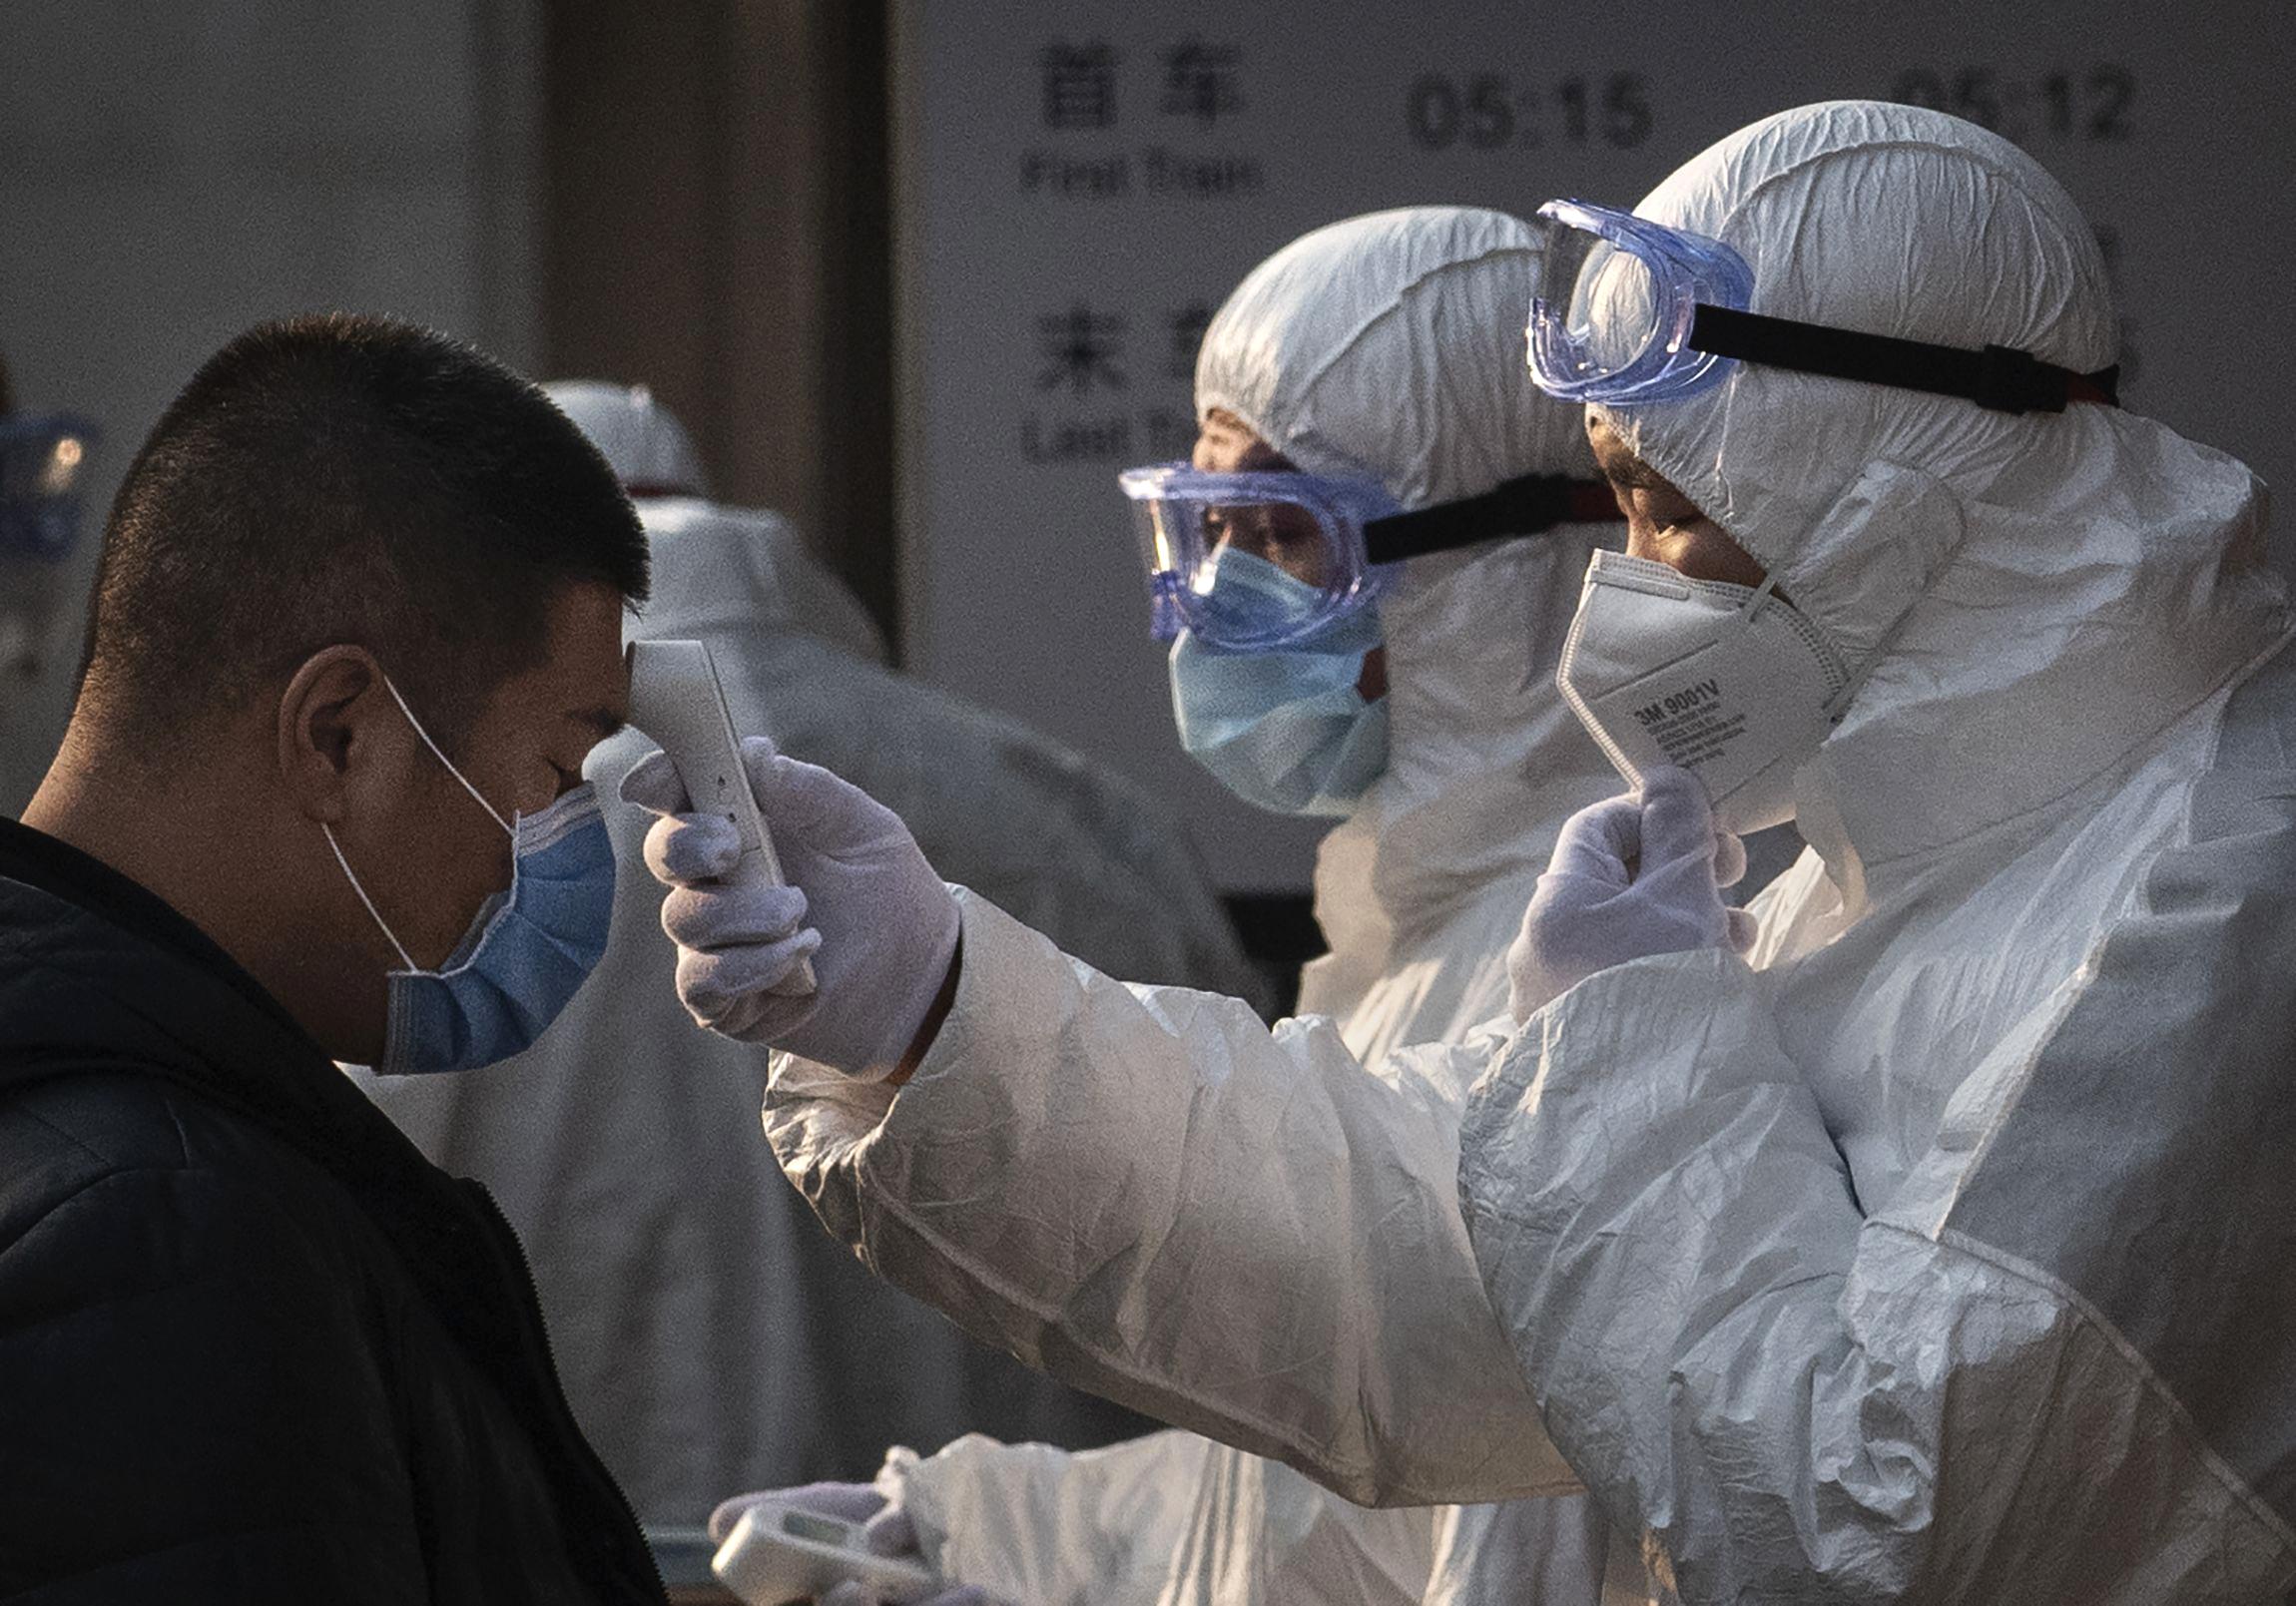 Coronavirus: China needs U.S. experts, health officials say